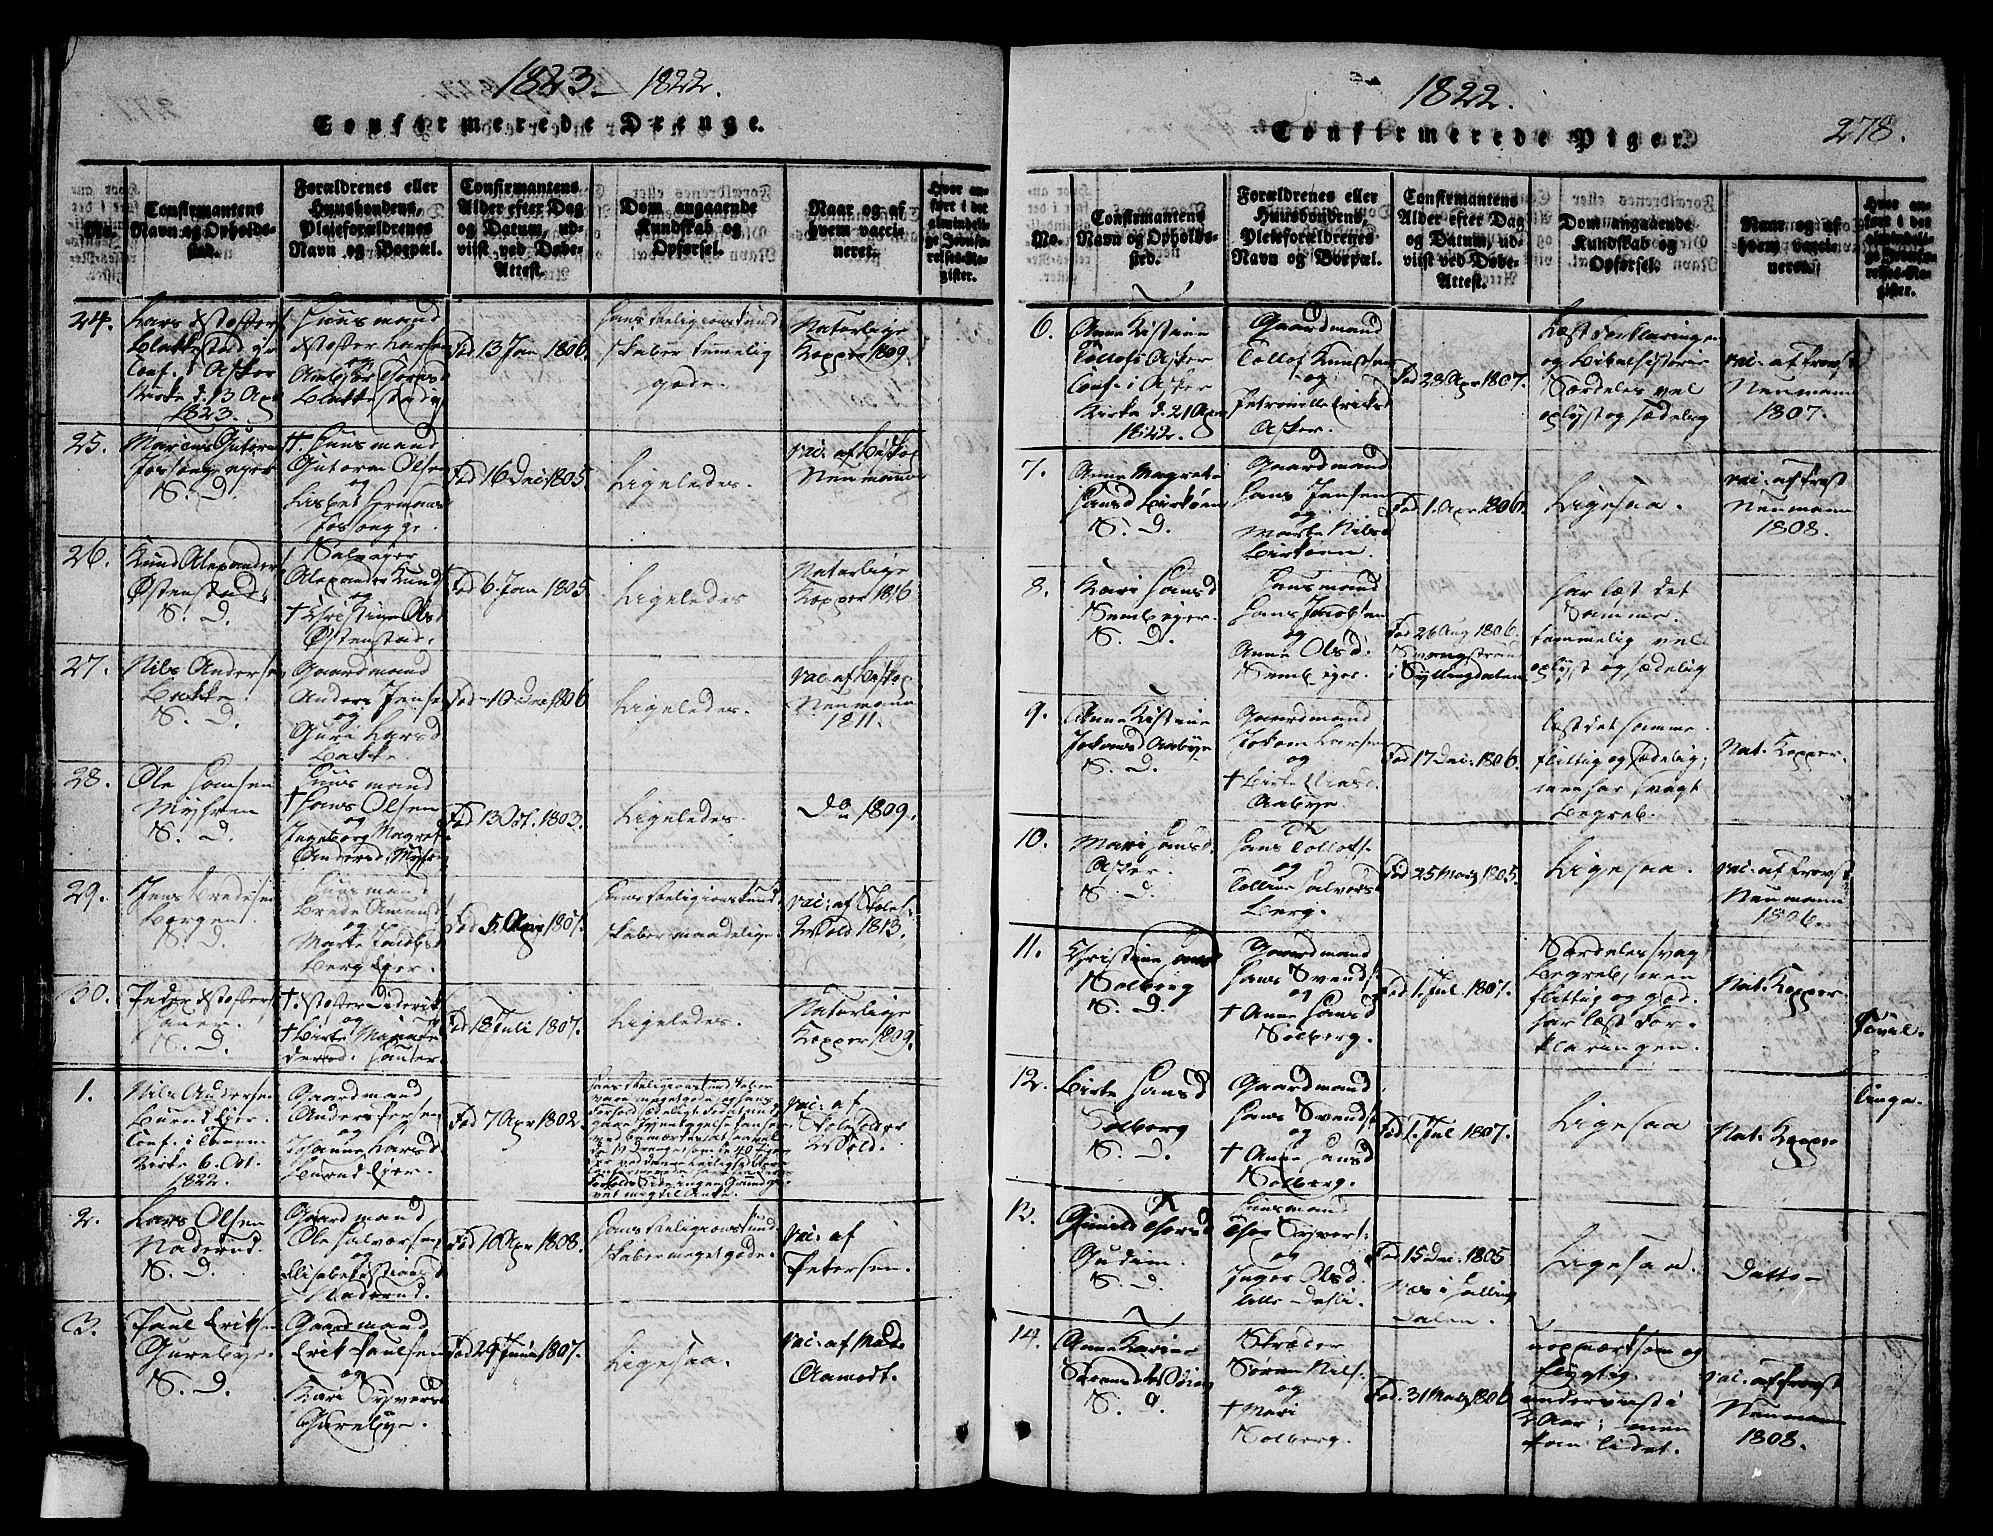 SAO, Asker prestekontor Kirkebøker, G/Ga/L0001: Klokkerbok nr. I 1, 1814-1830, s. 278